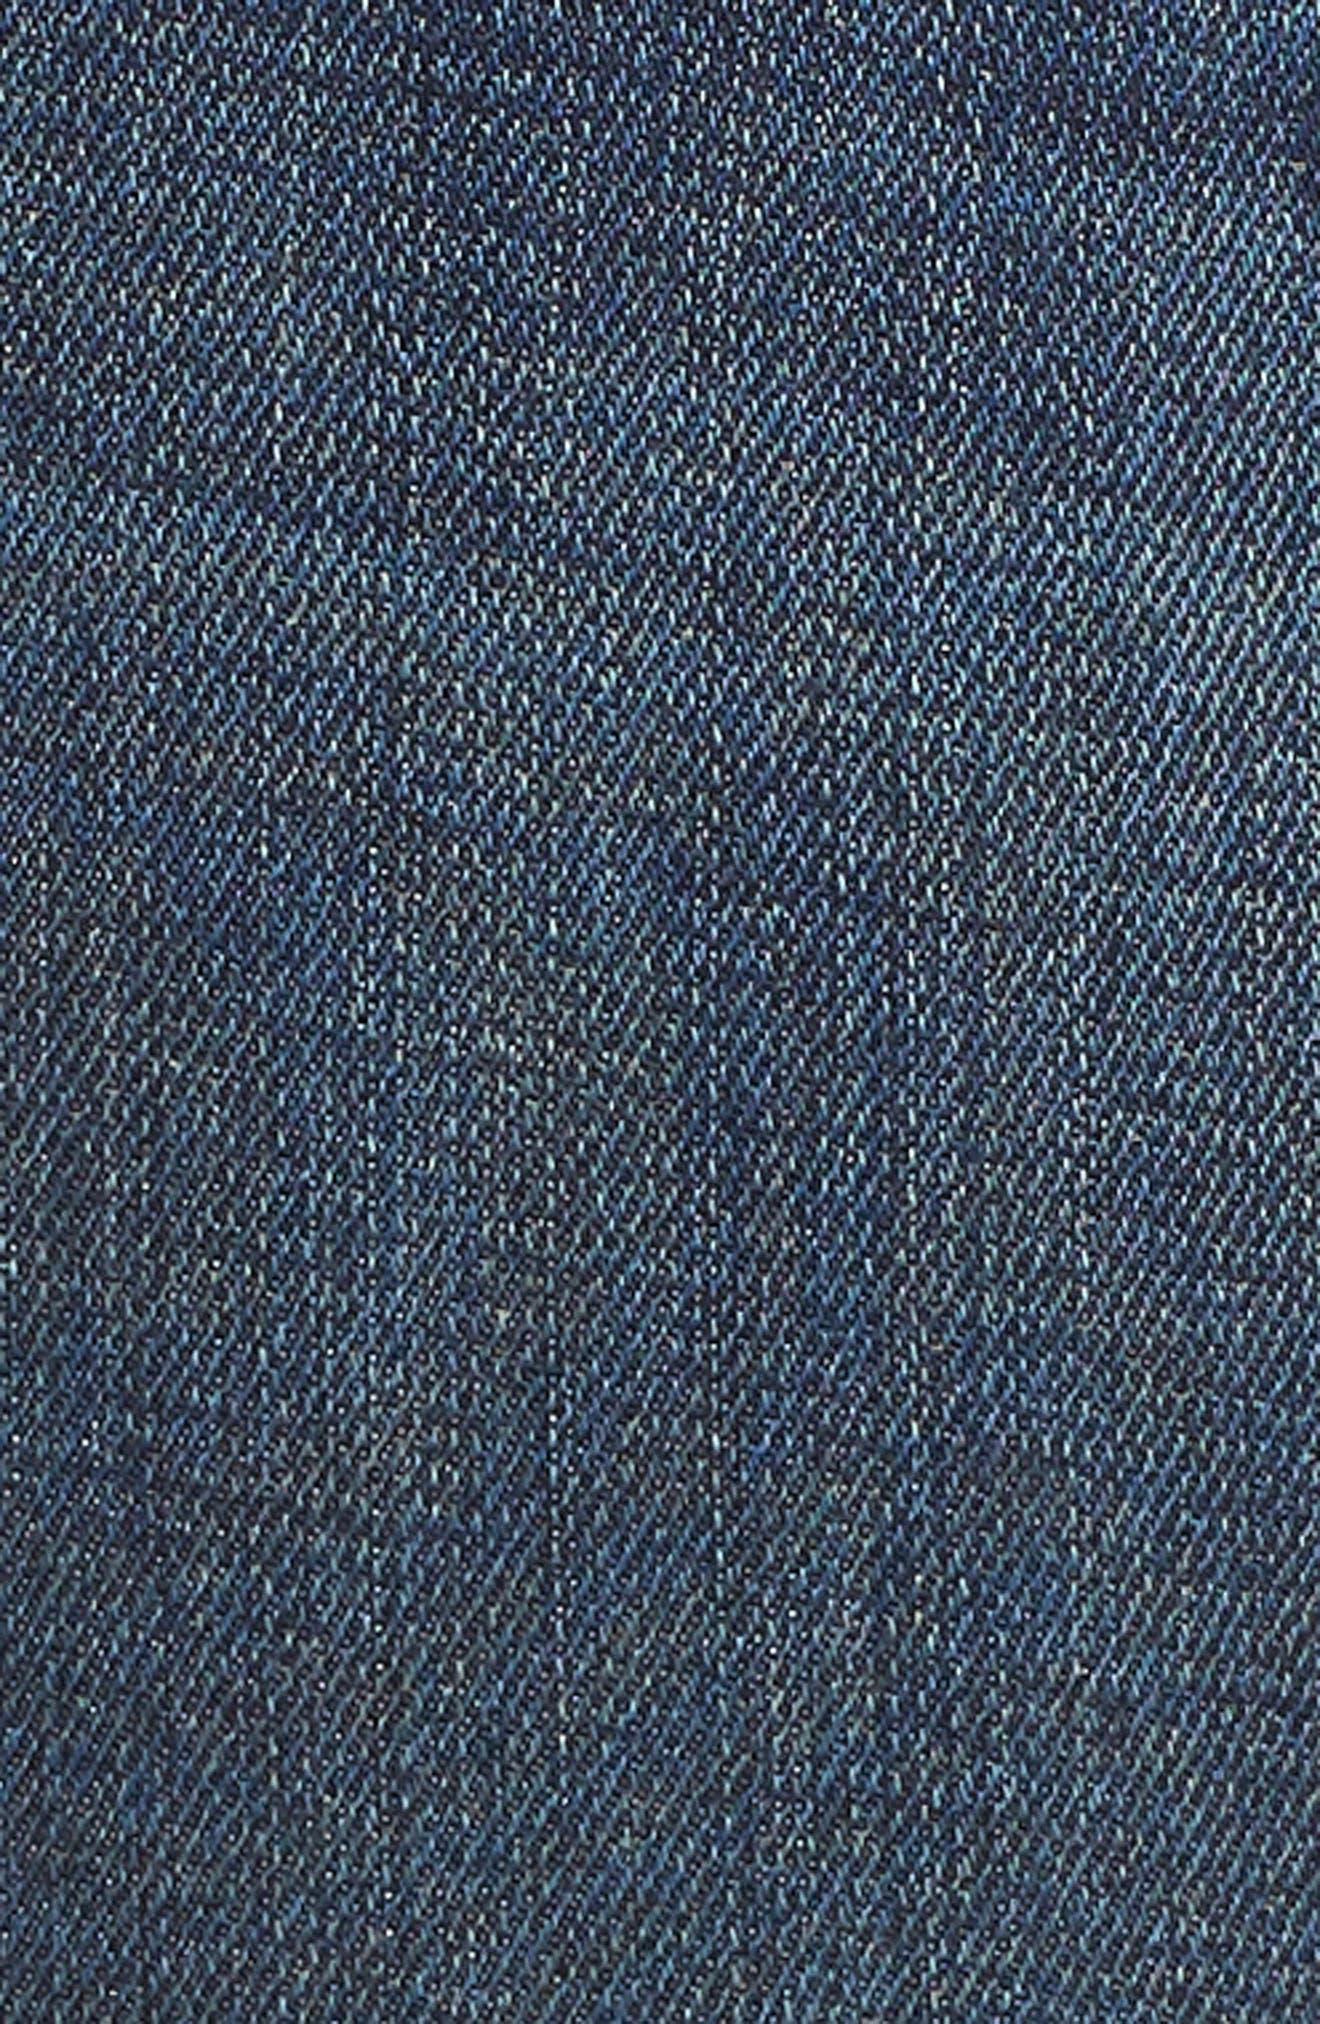 Indigo Curve Hem Skinny Jeans,                             Alternate thumbnail 6, color,                             DARK AUTHENTIC